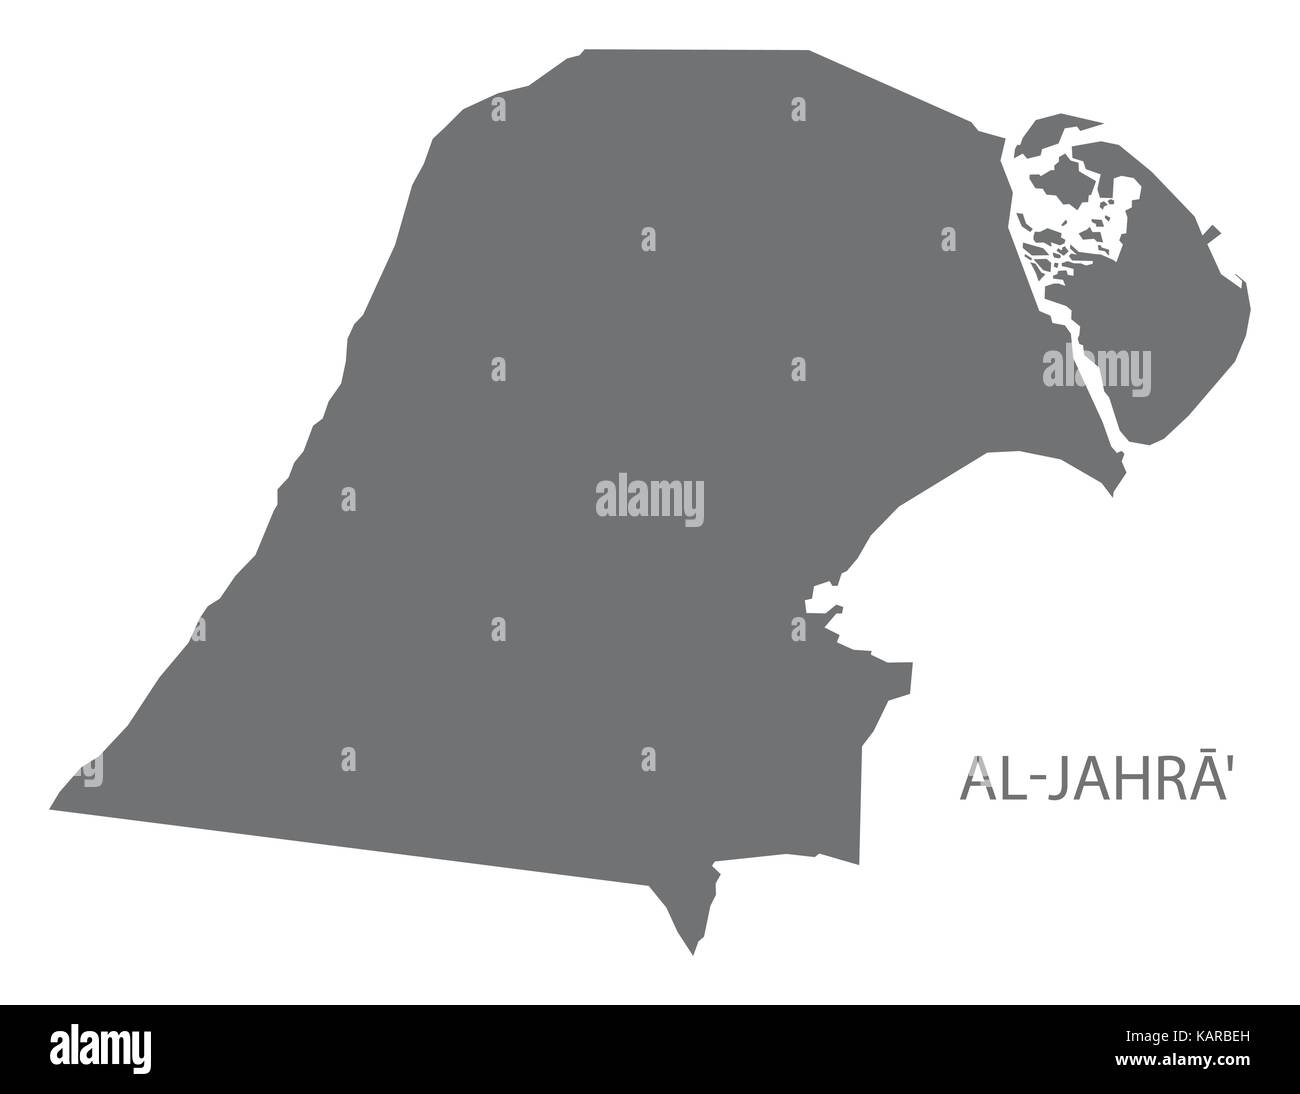 AlJahra province map of Kuwait grey illustration silhouette shape